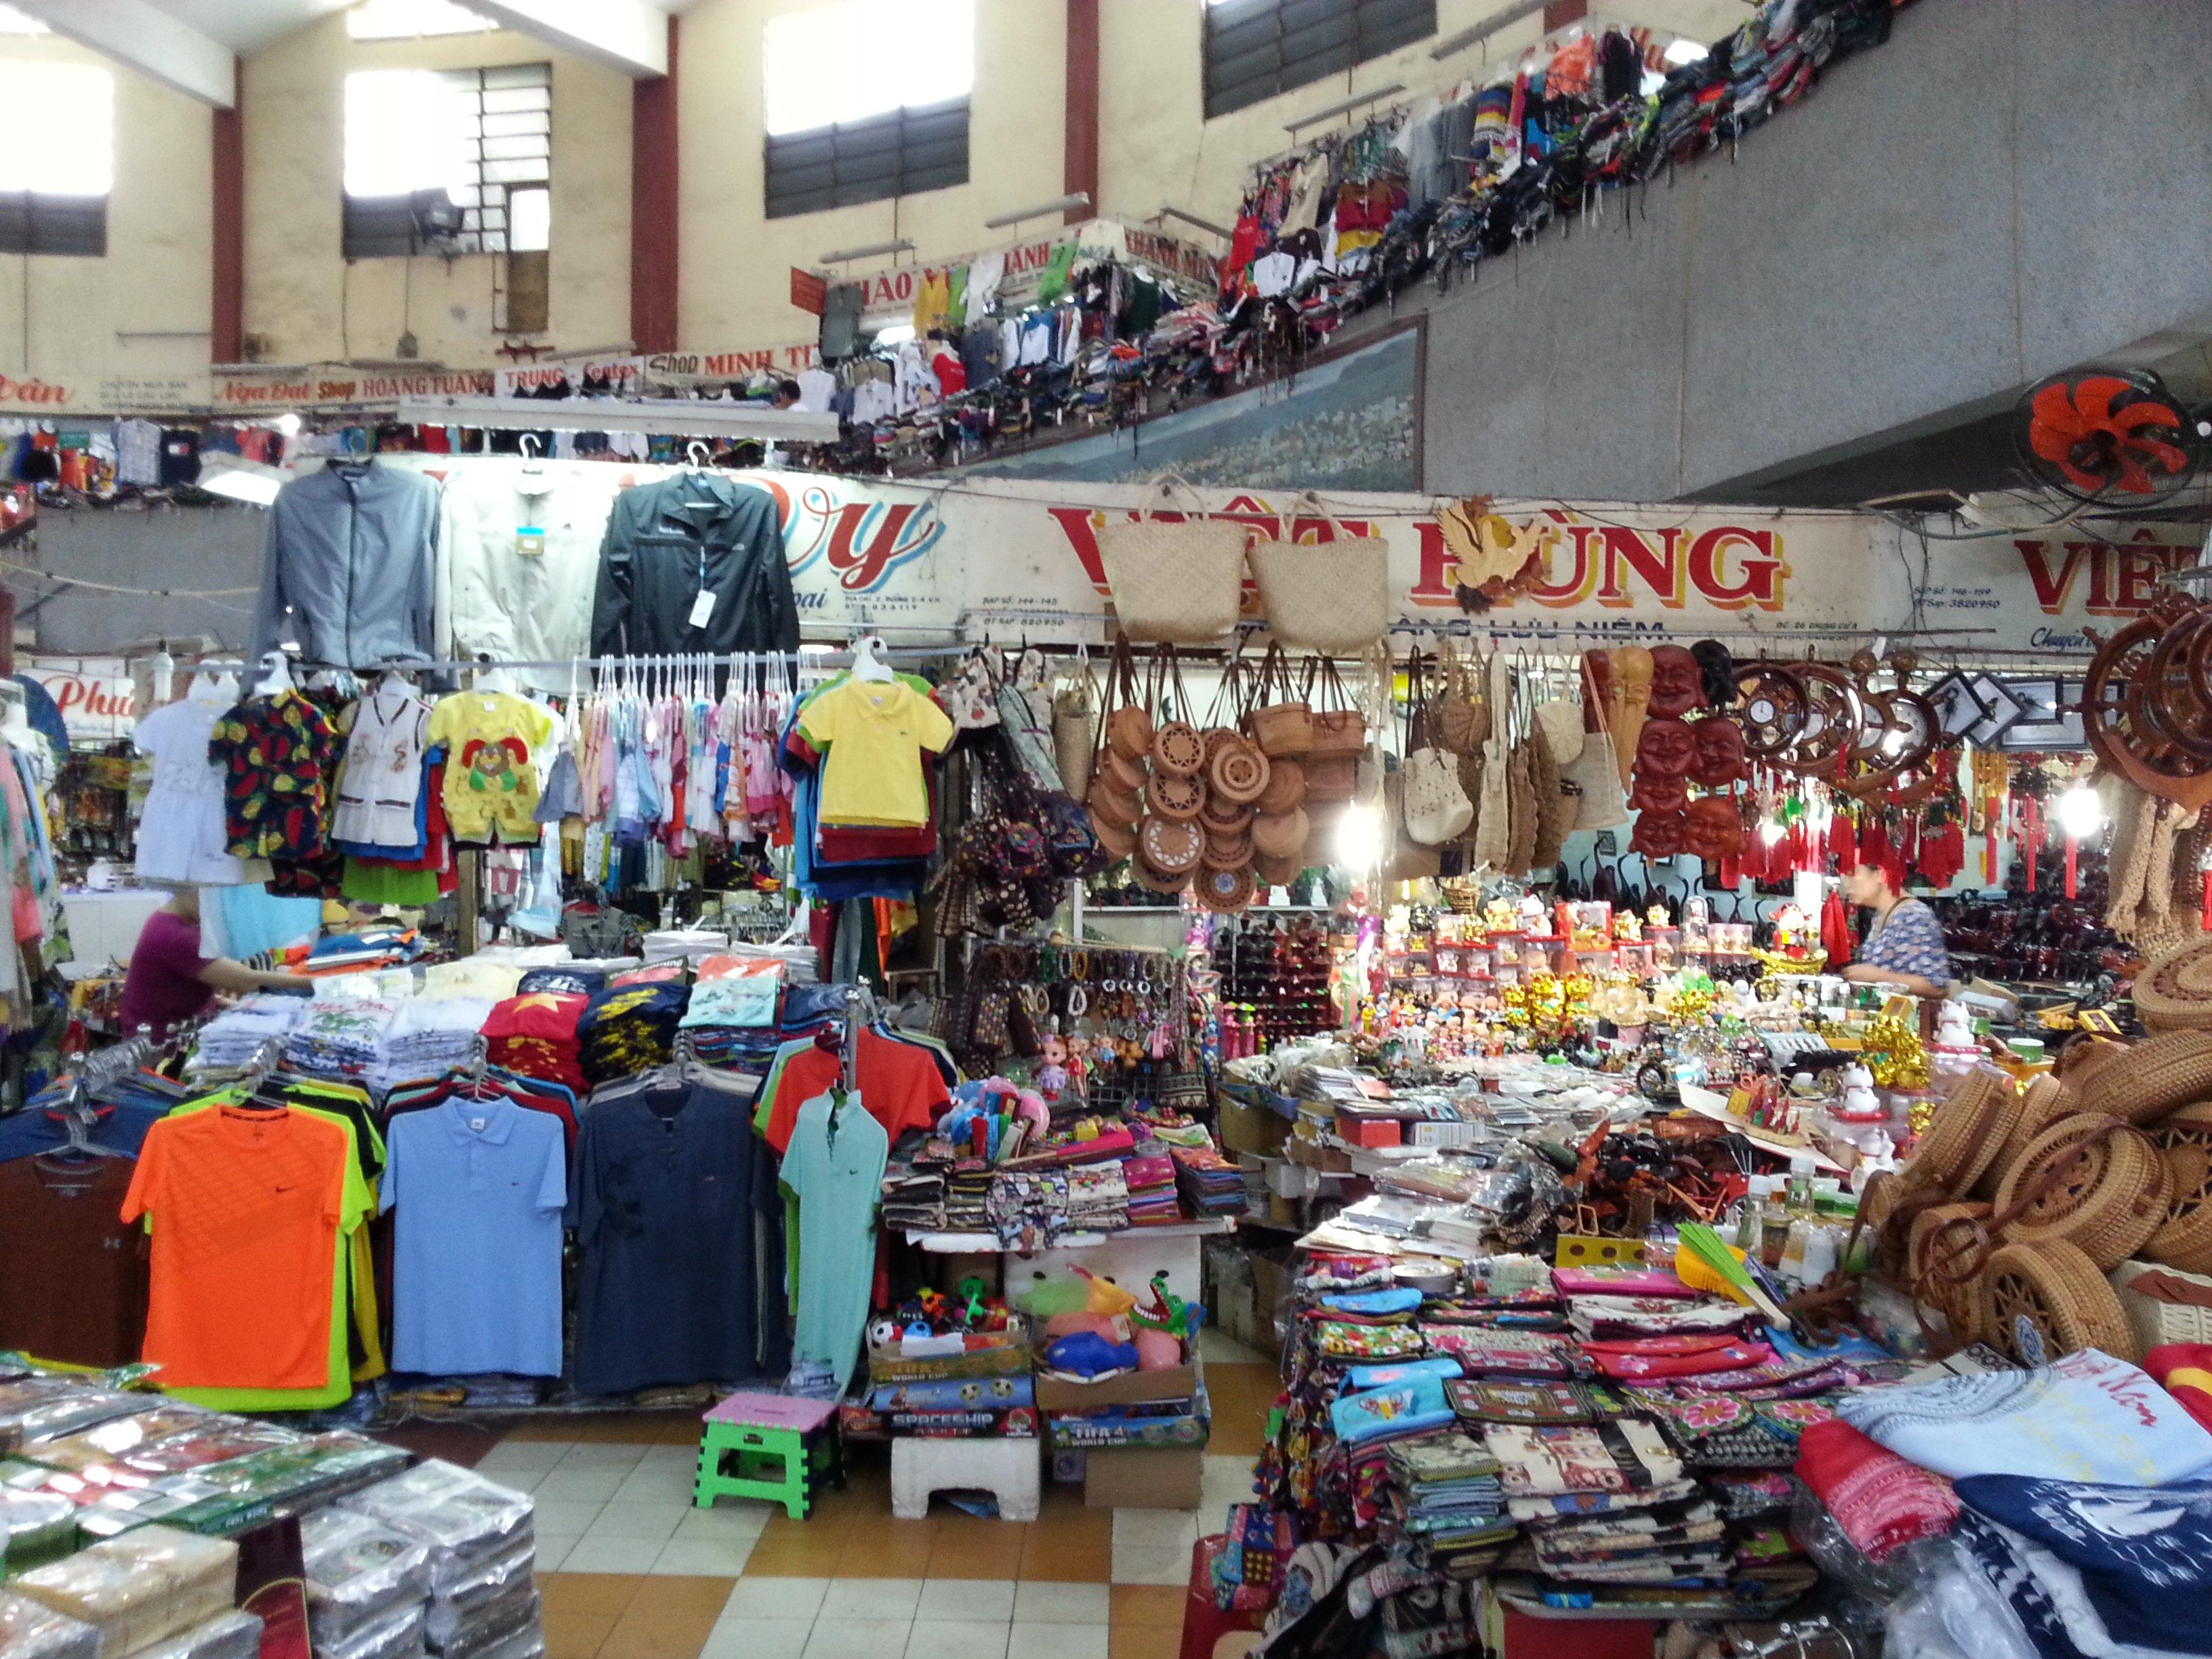 Inside the clothing market at Dam Market